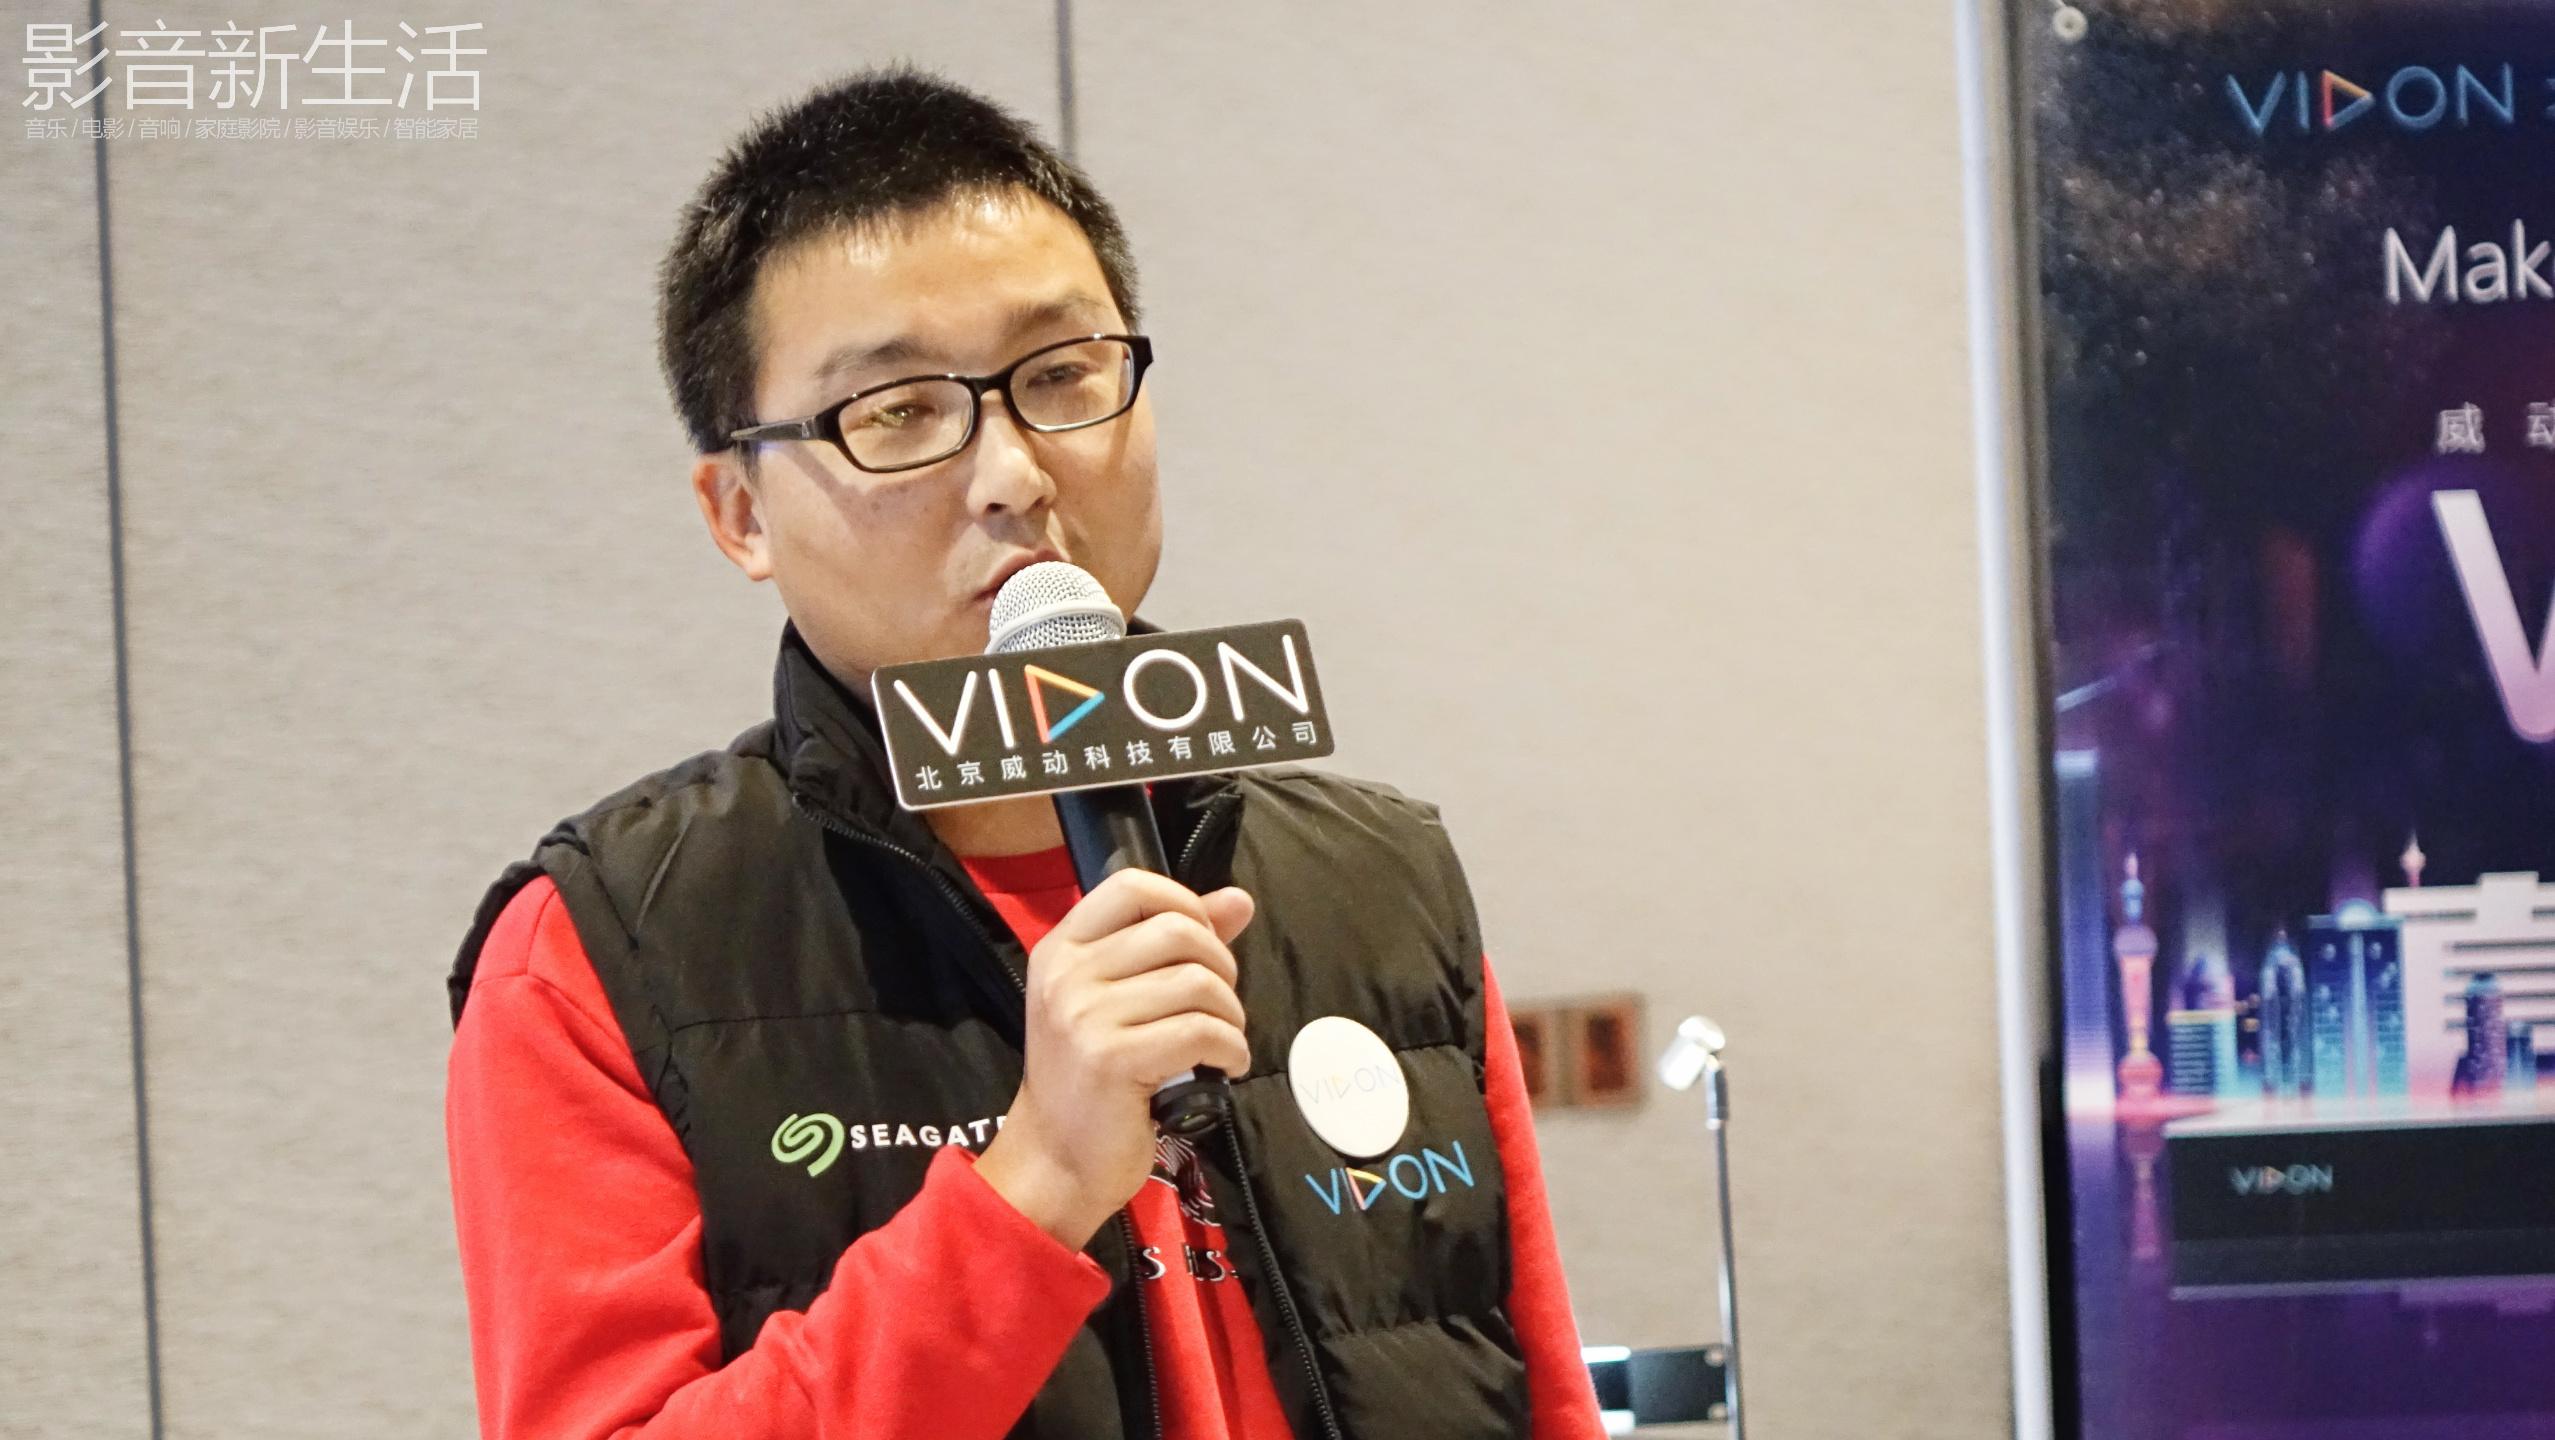 "VIDON V20 UHD HDR 5 - 发布 | ""2019 UHD 超高清影音播放新高度"" VIDON 威动 V20 智能影库发布!"